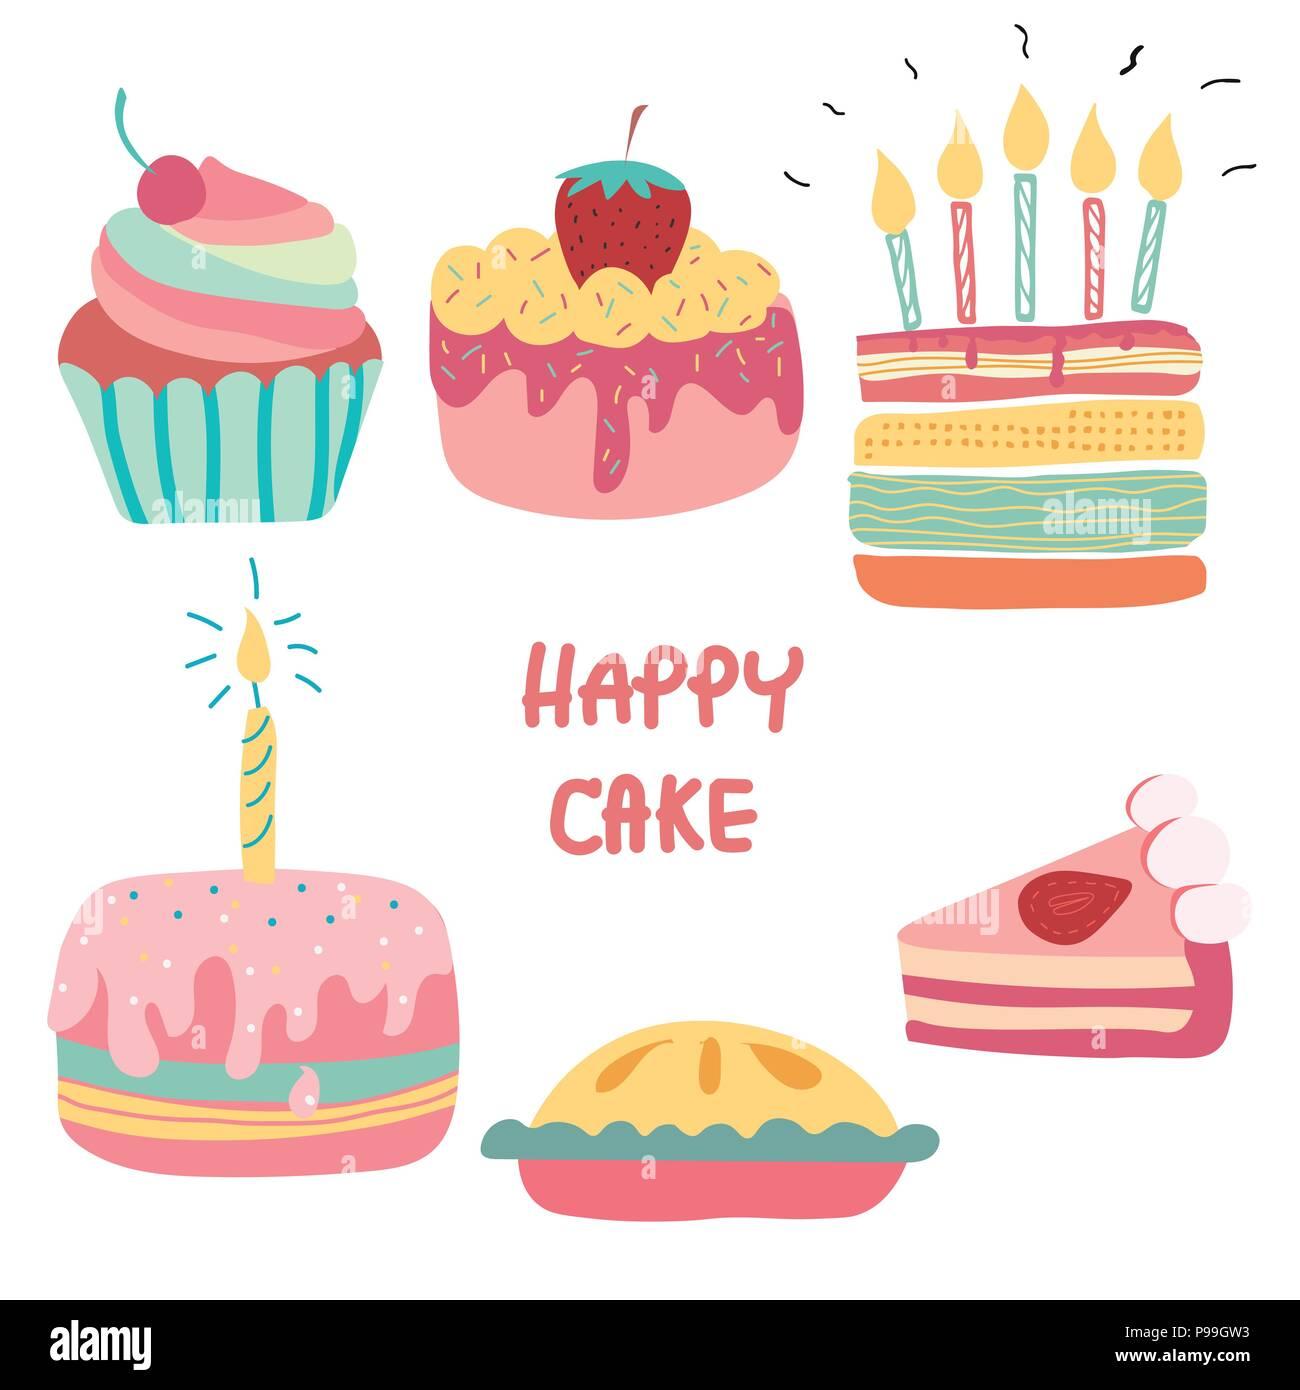 Doodle Hand Drawn Rainbow Cute Birthday Cake Stock Vector Art